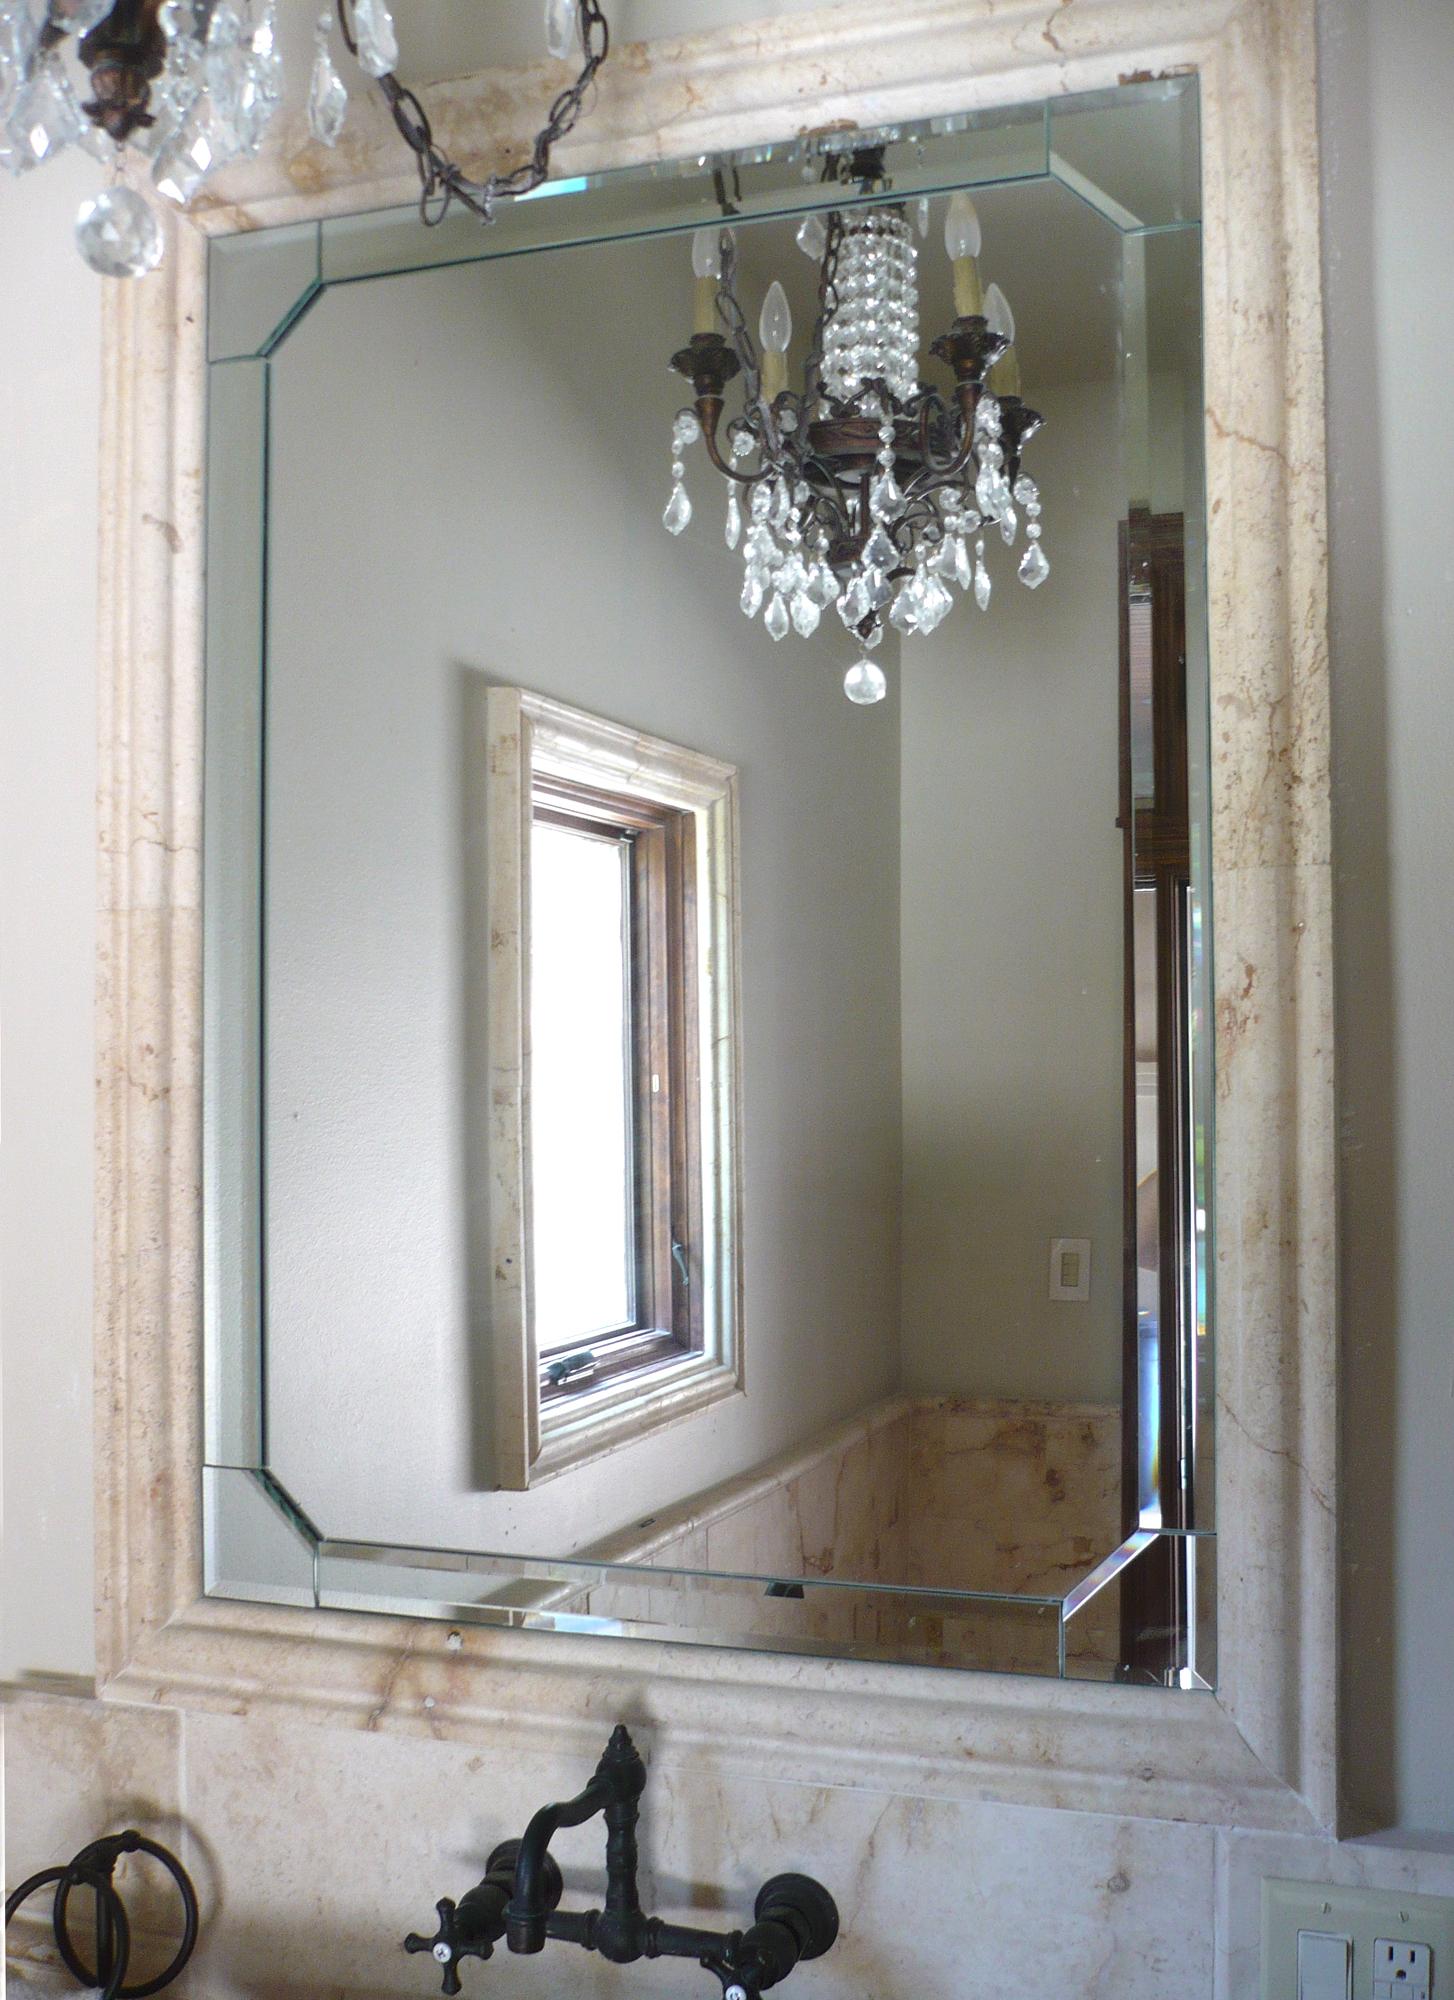 15_interior_Leto_bath_1454x2000_P1060803.jpg